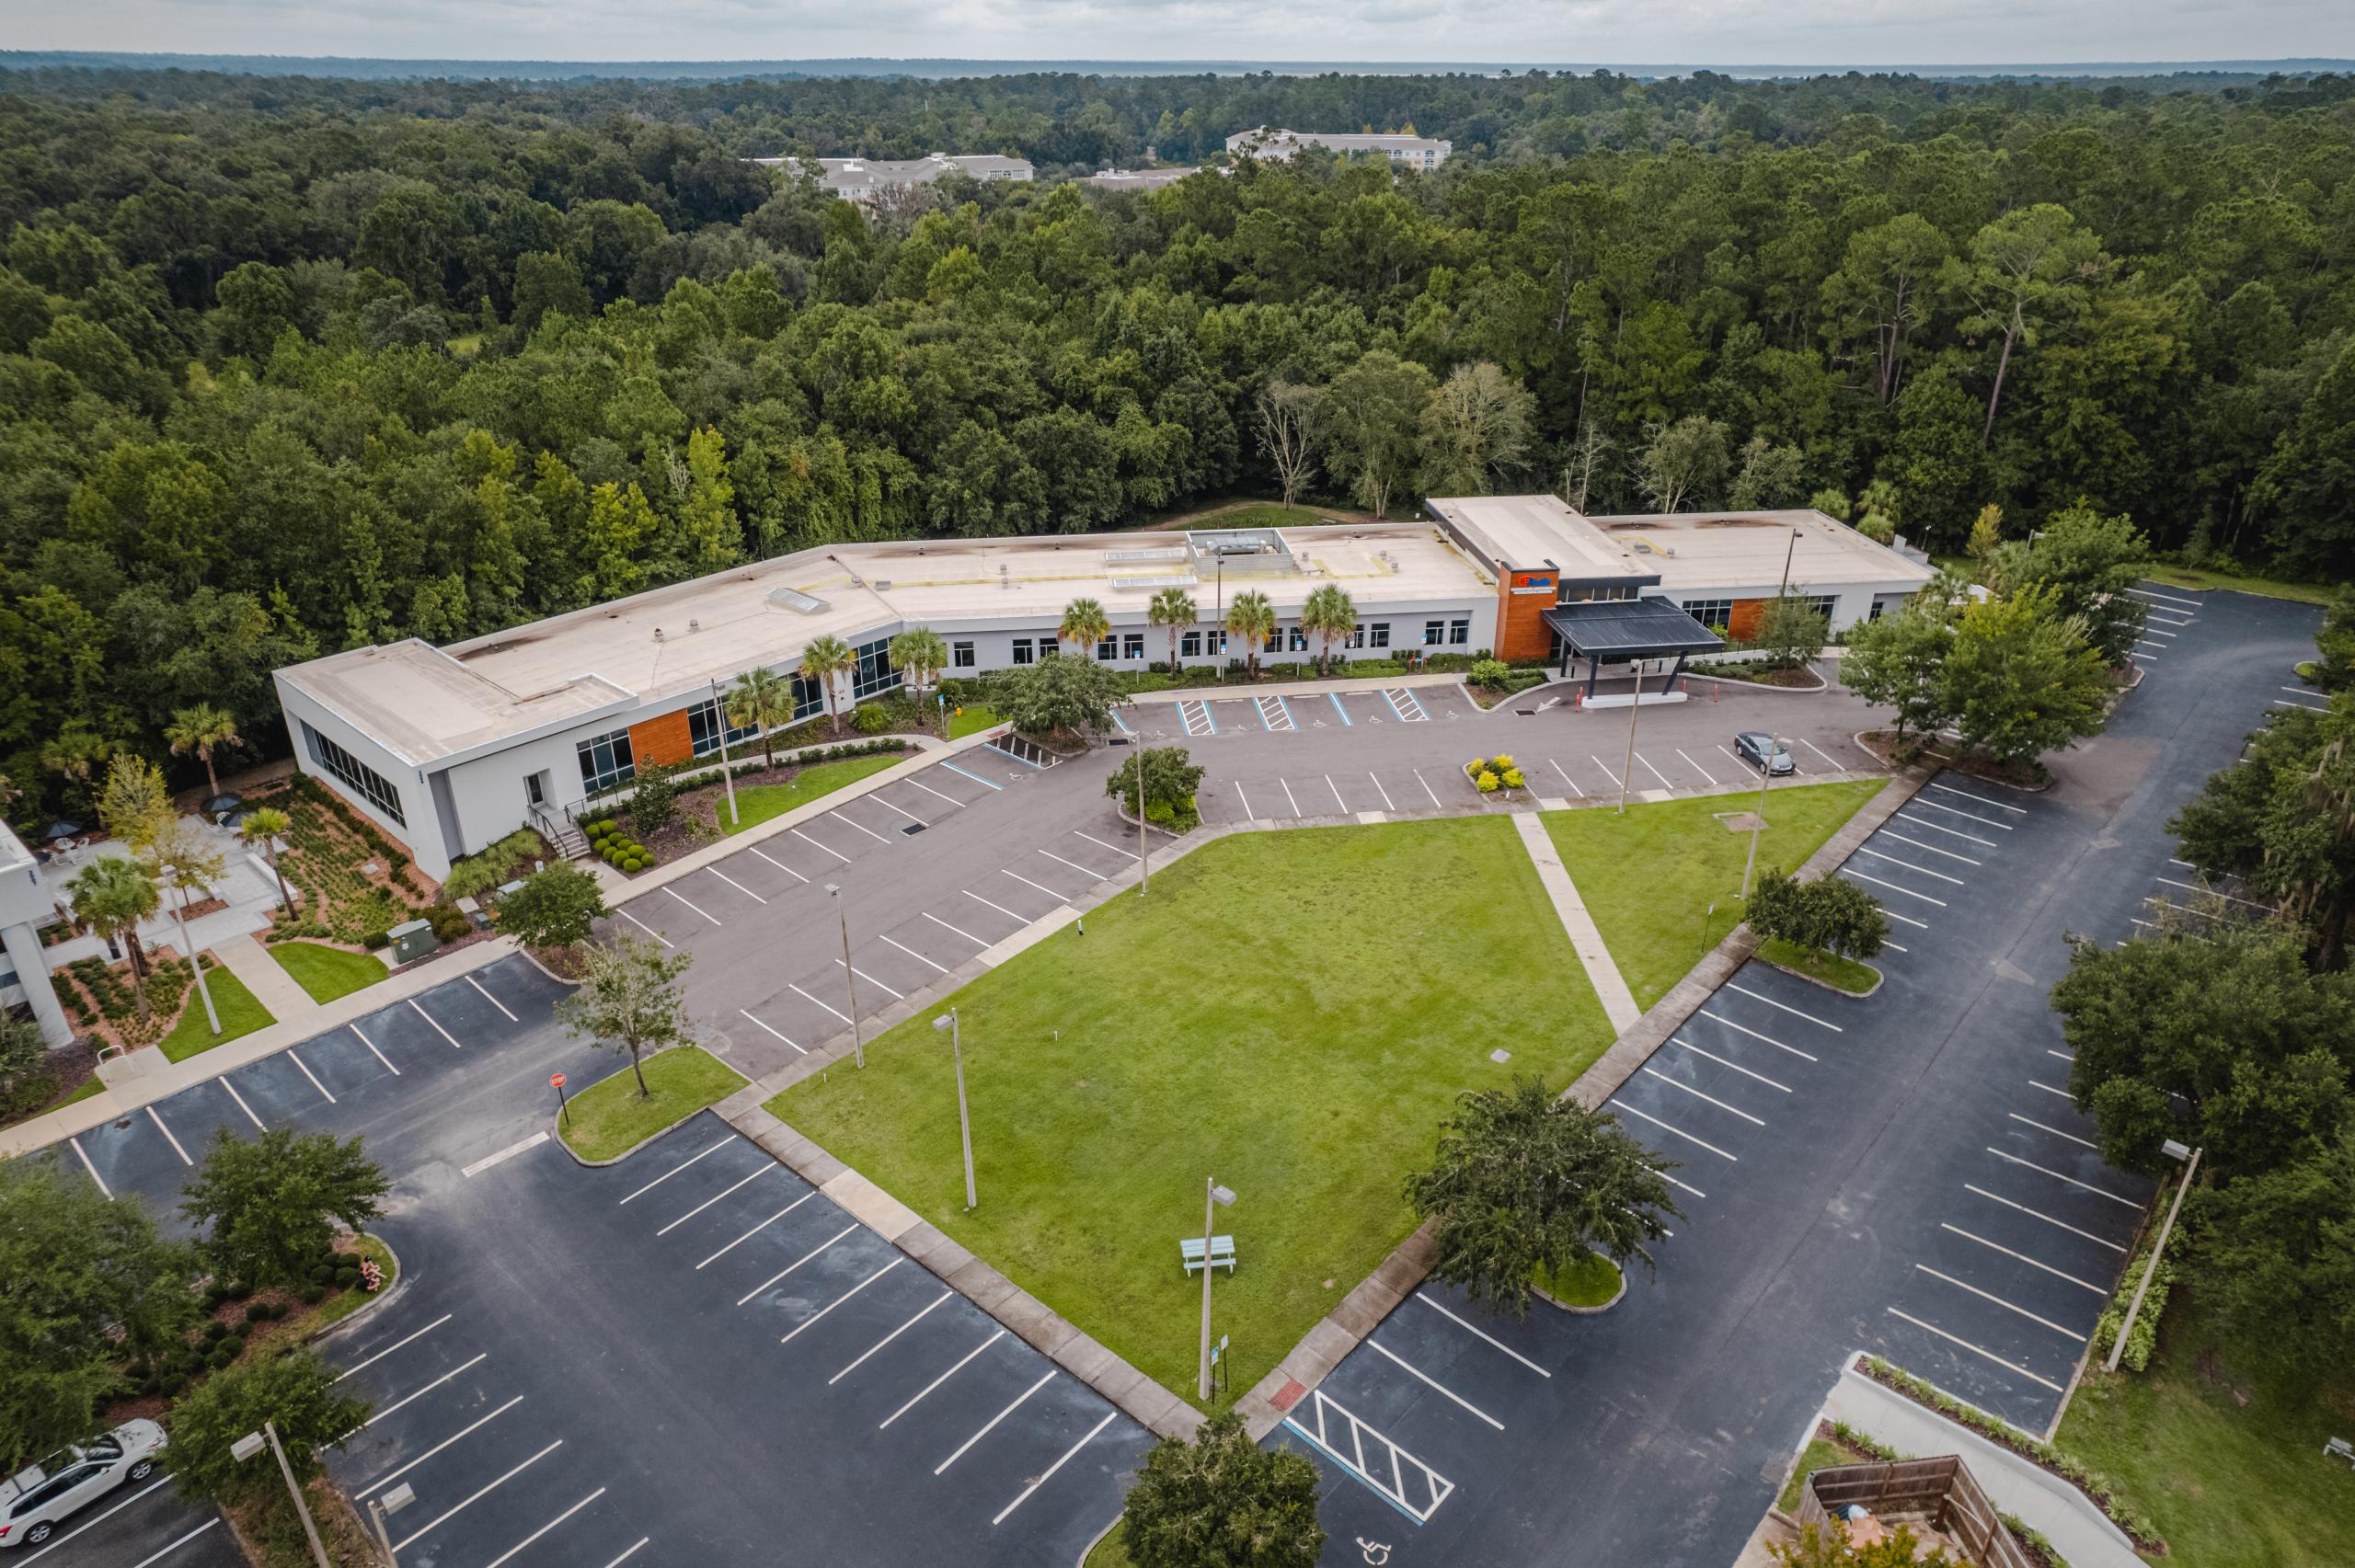 aerial shot of the Fixel institute